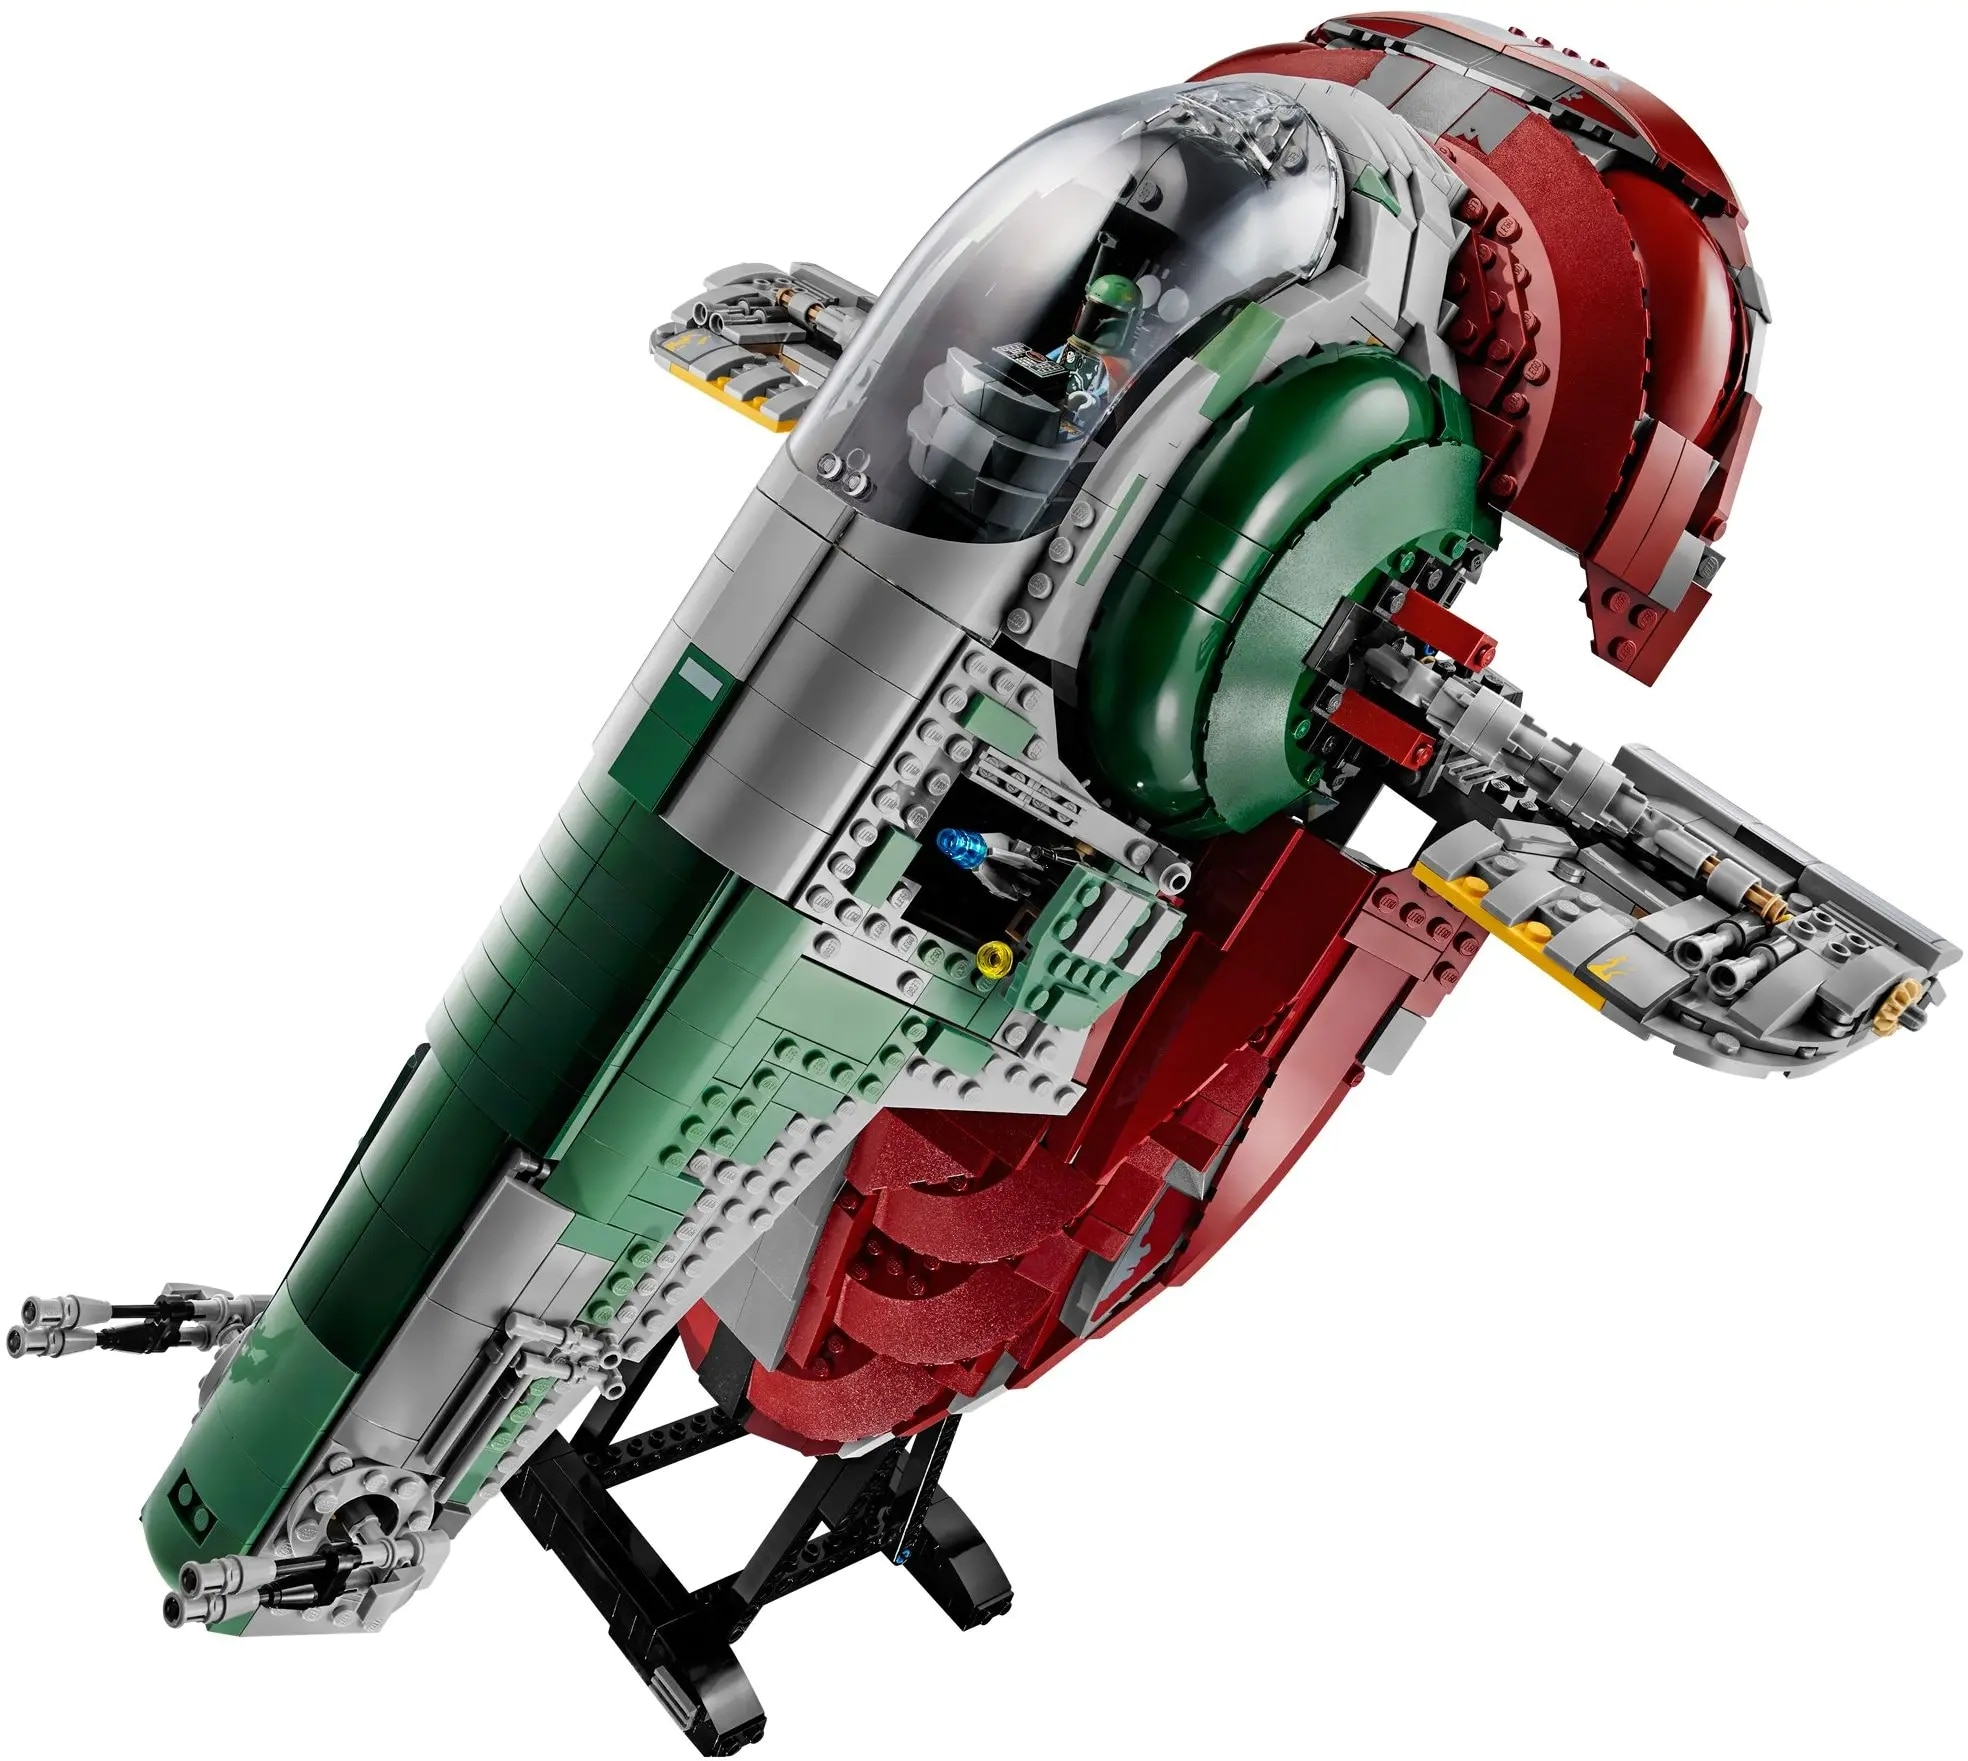 the-genuine-ucs-slave-i-slave-no1-2067pcs-mobile-compatibile-building-starwarlys-movie-bricks-moc-model-toys-educational